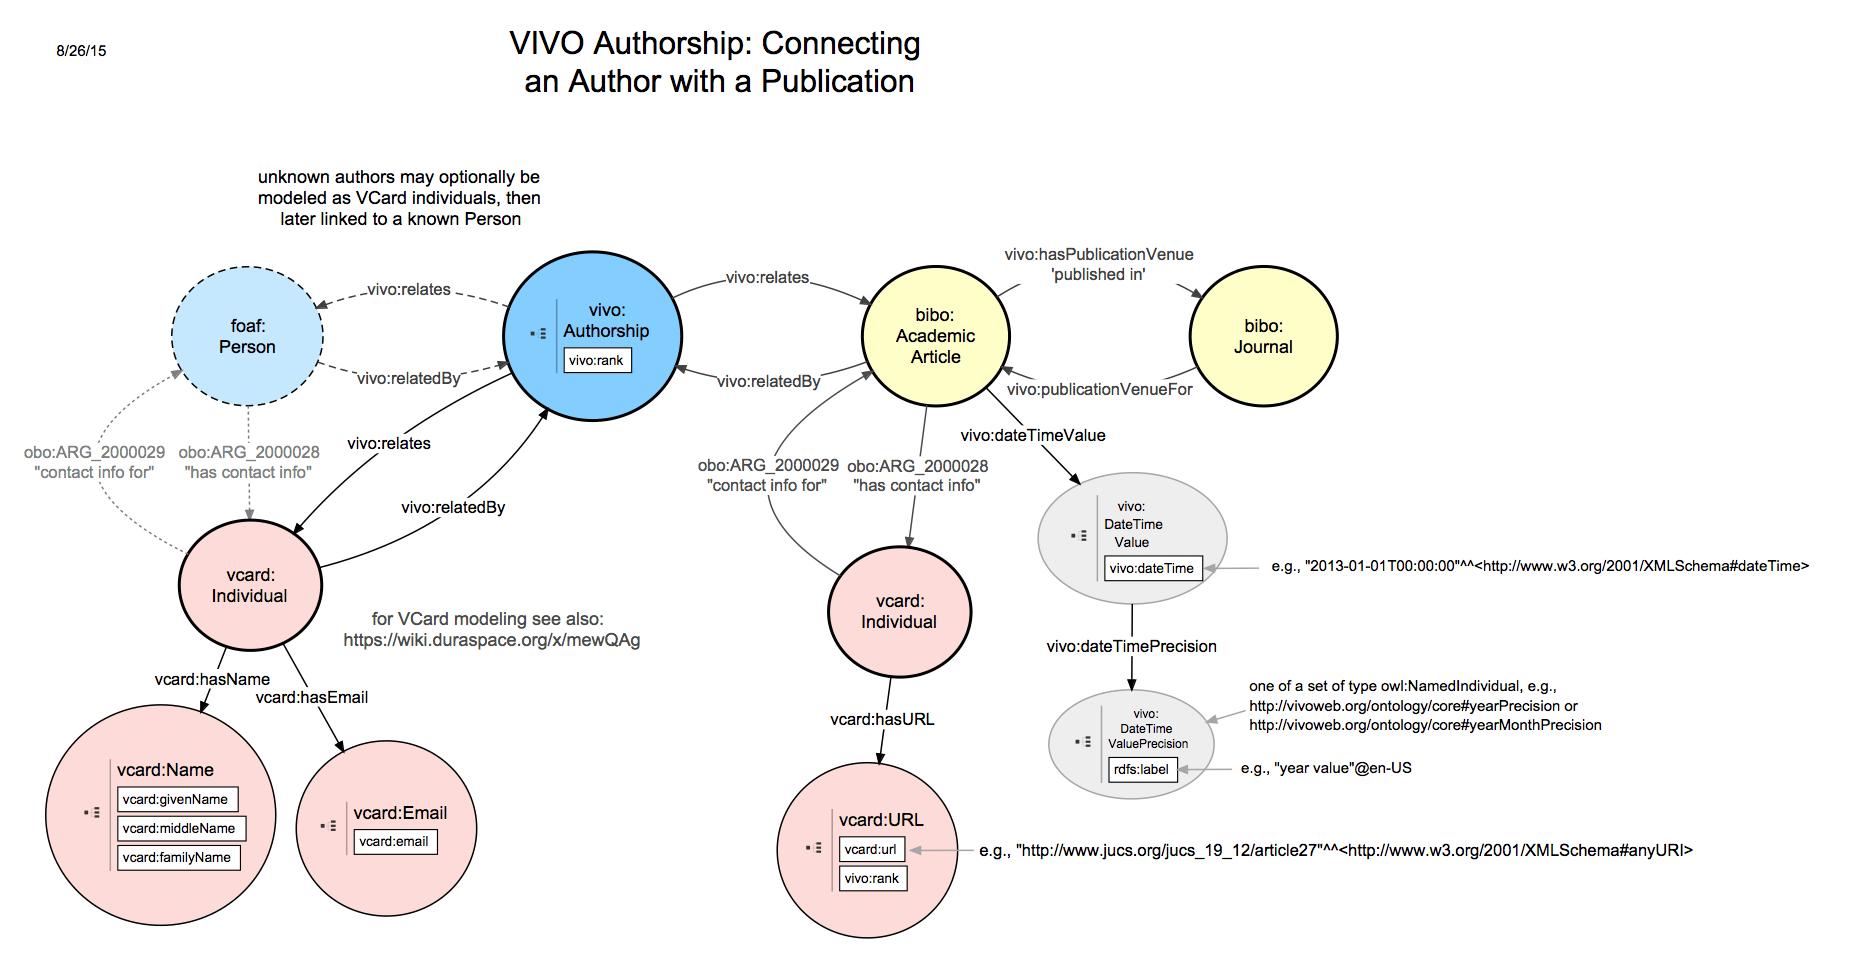 VIVOISF 16 relationship diagrams: Authorship  VIVO